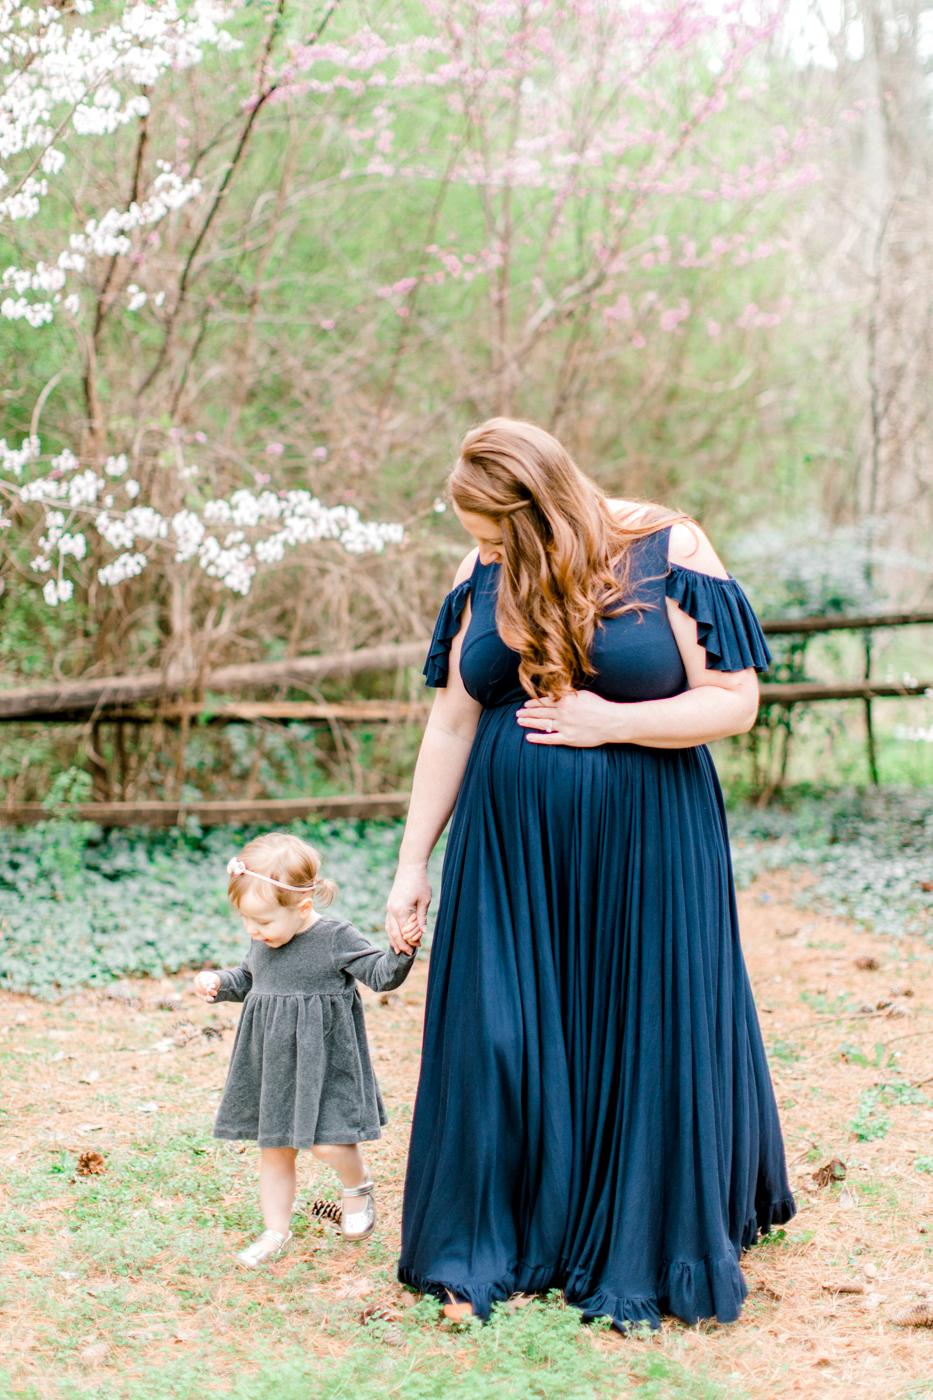 spring maternity session atlanta newborn photographer atlanta newborn photography maternity photography four corners photography lily lauren williams maternity session avondale estates (23 of 34).jpg